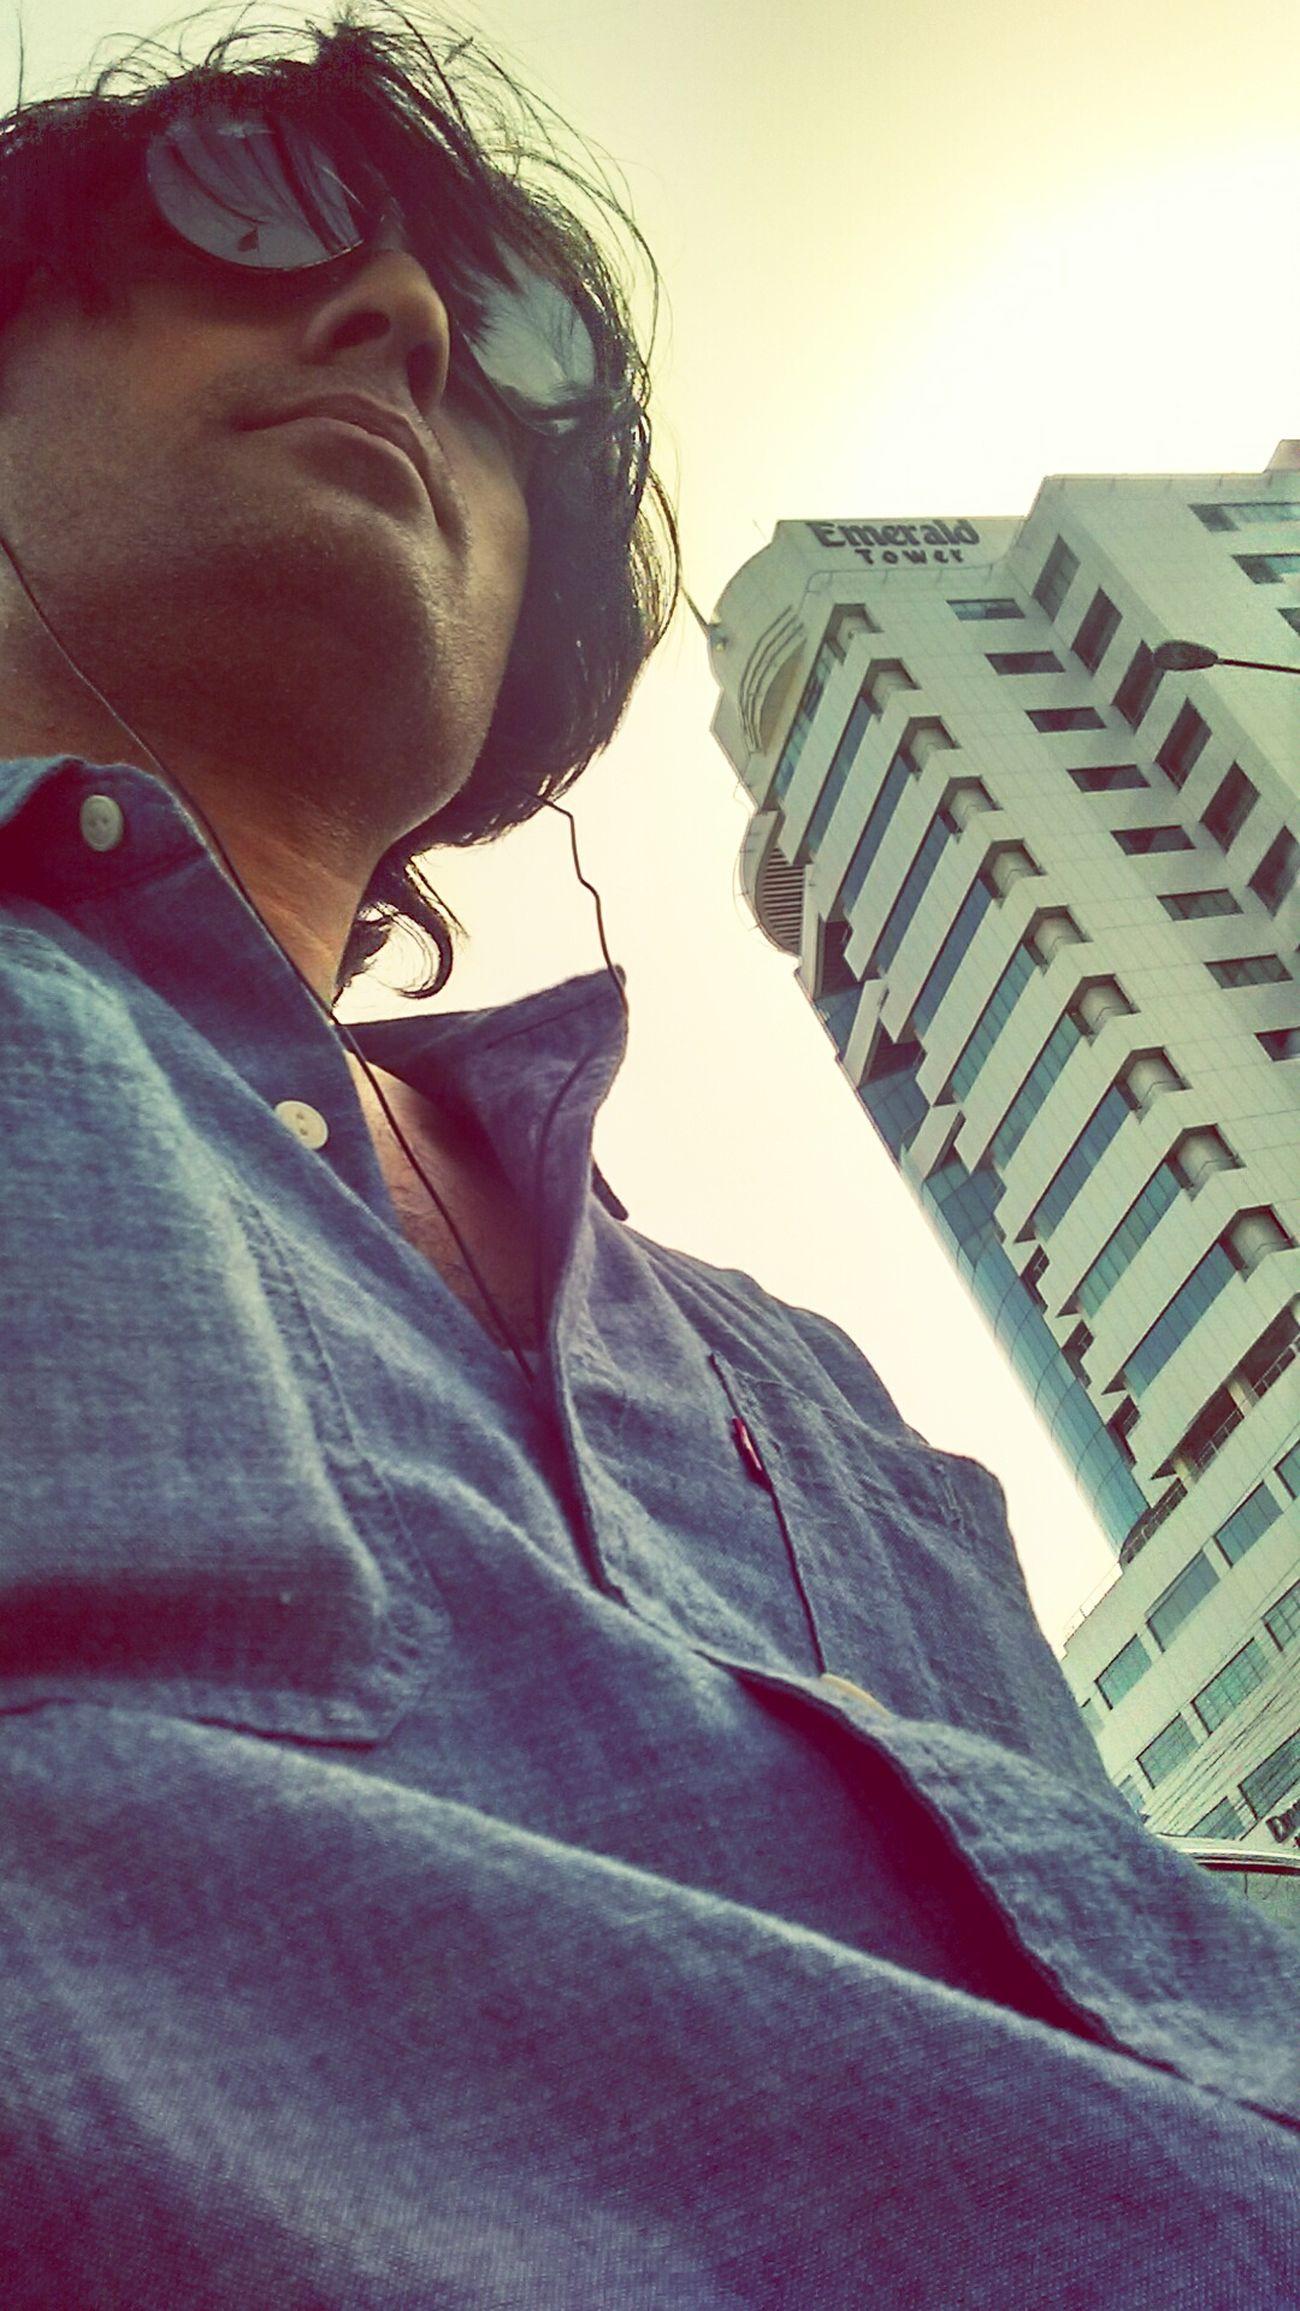 Selfie Mobilecam City Outdoors Sky Free Evening Karachi Pakistan First Eyeem Photo